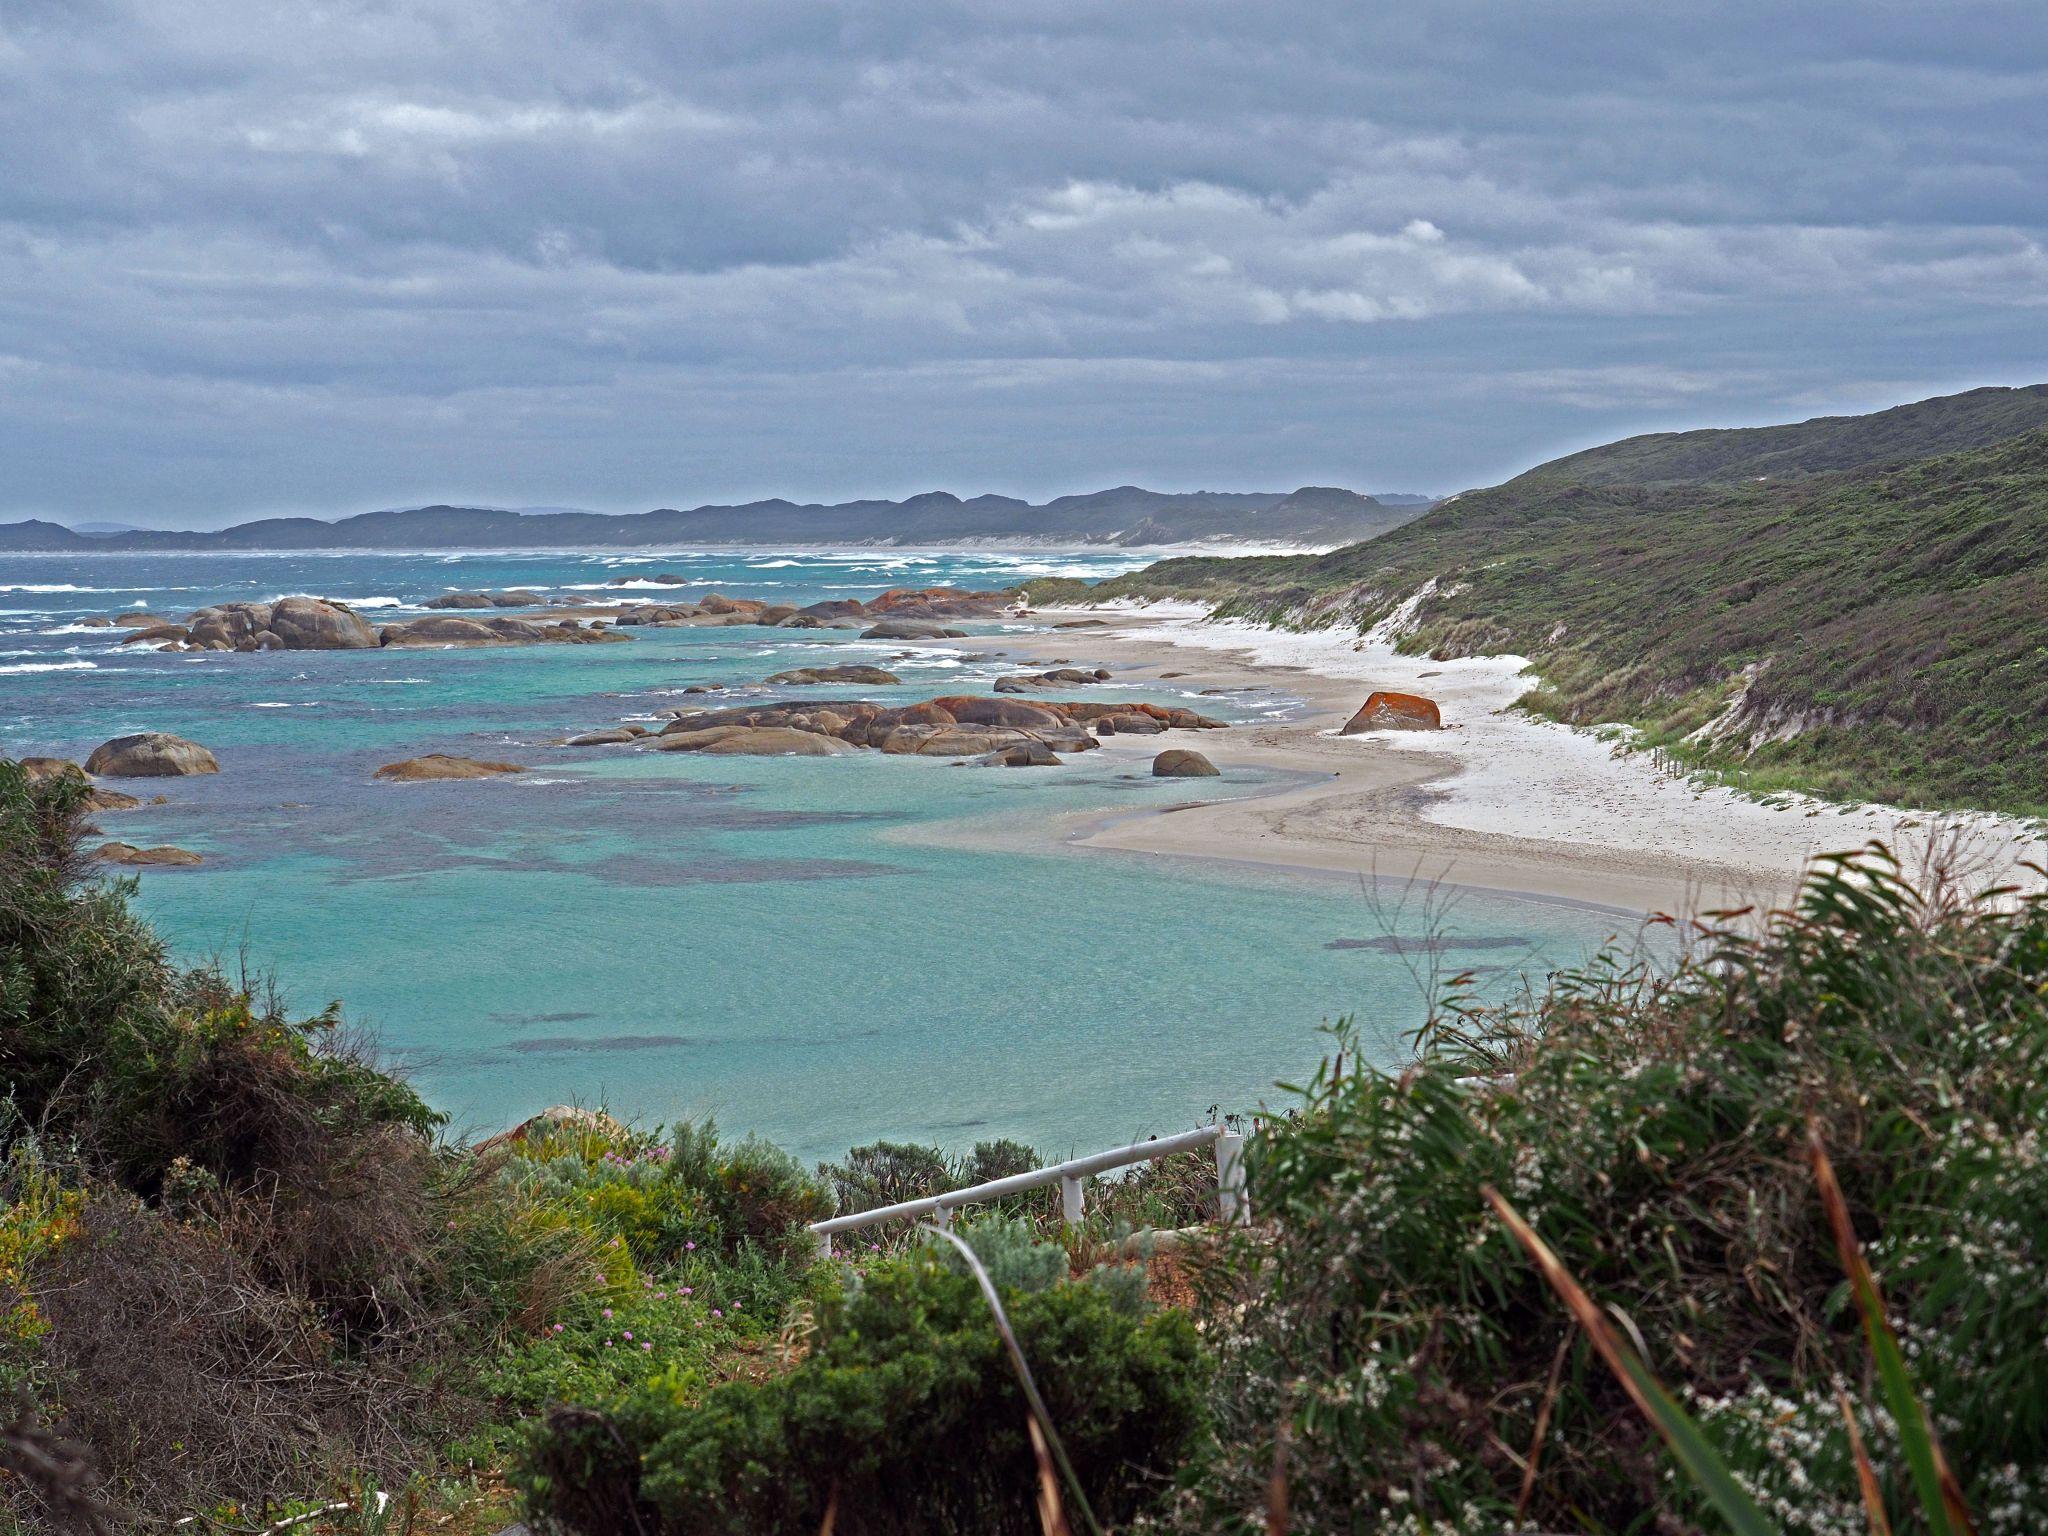 Greens Pool and Elephant rocks, Australia